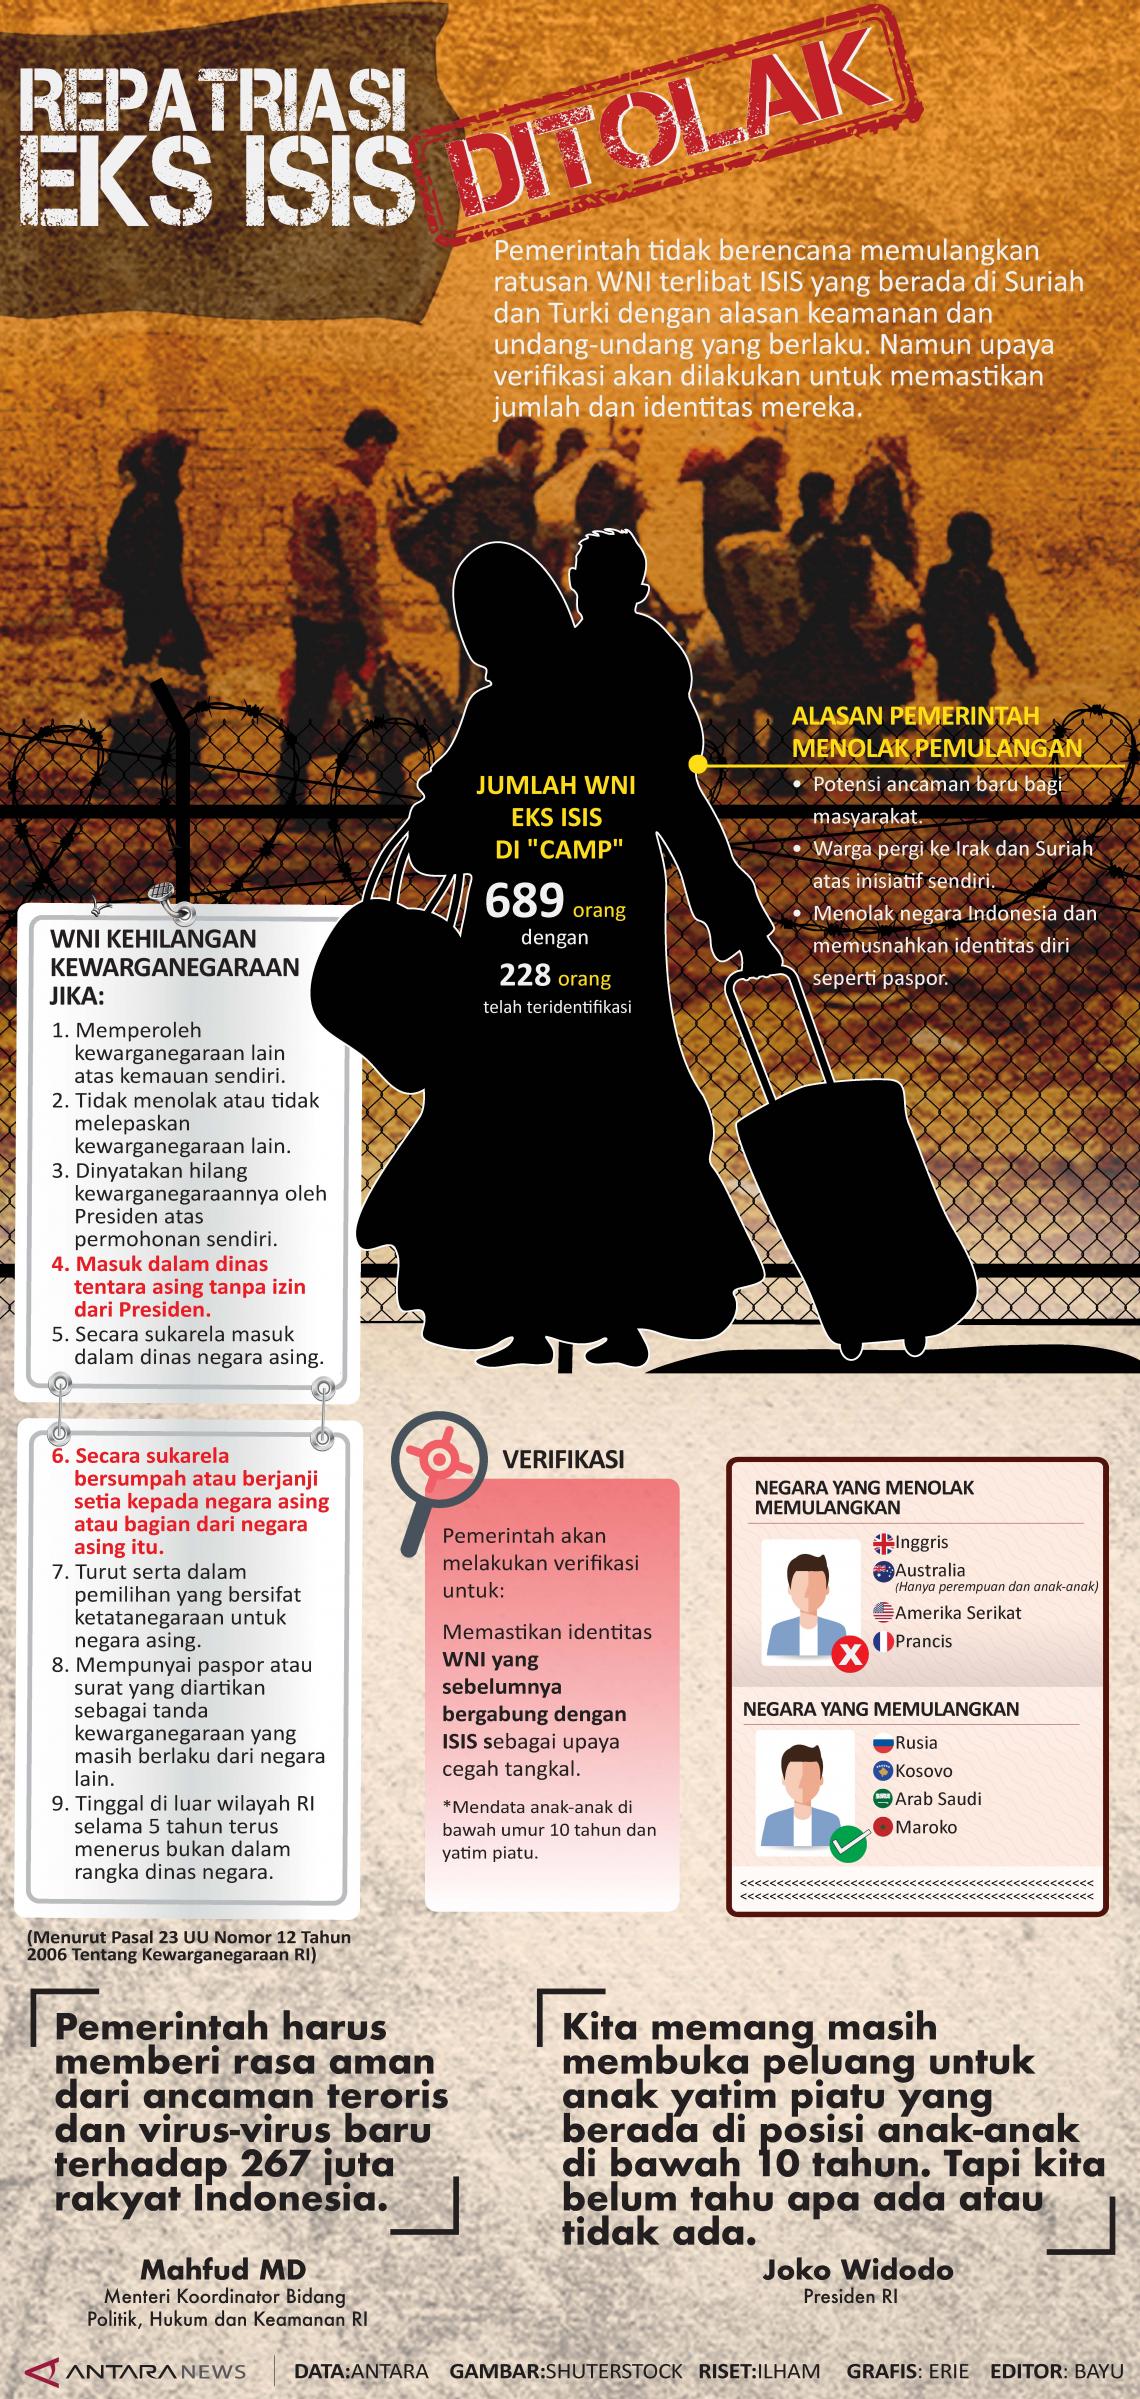 Repatriasi WNI eks ISIS ditolak